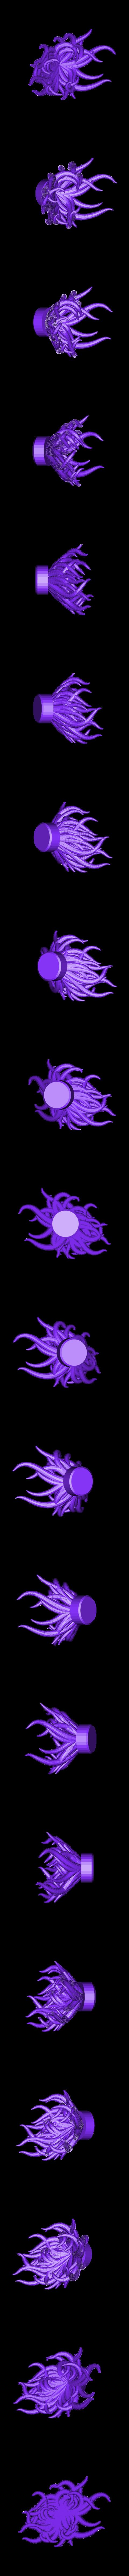 tentacle5.stl Download free STL file Plastic Reef #1: Random Anemone Generator • Object to 3D print, ferjerez3d